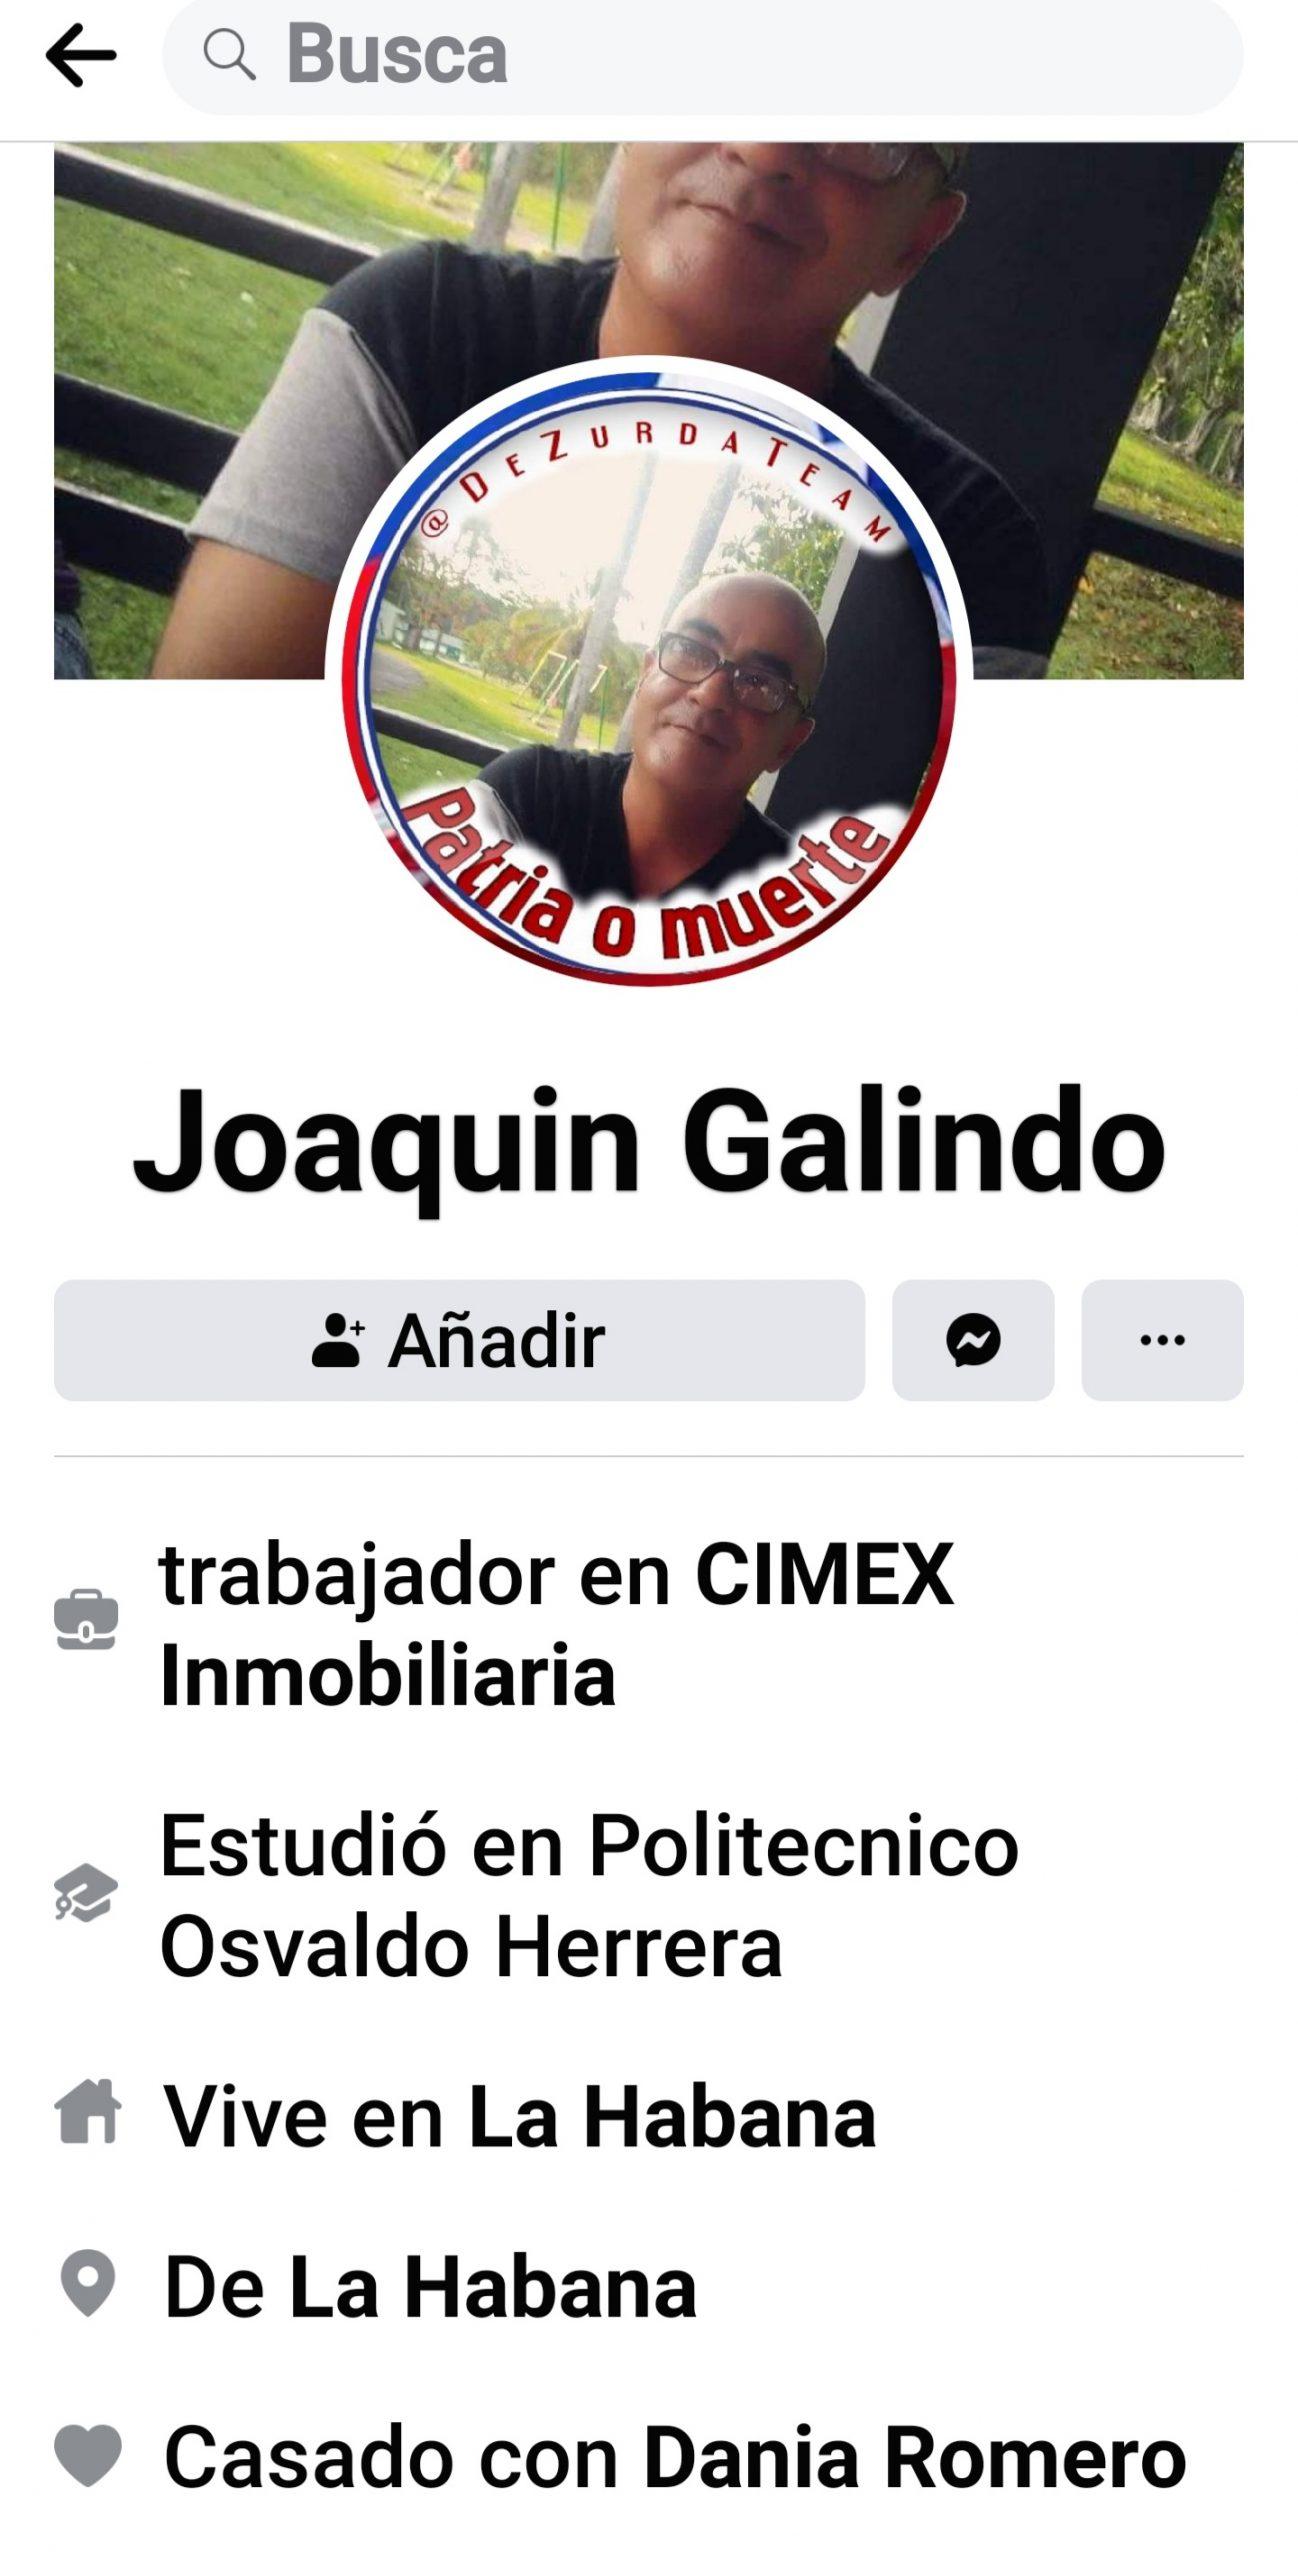 Joaquin Galindo